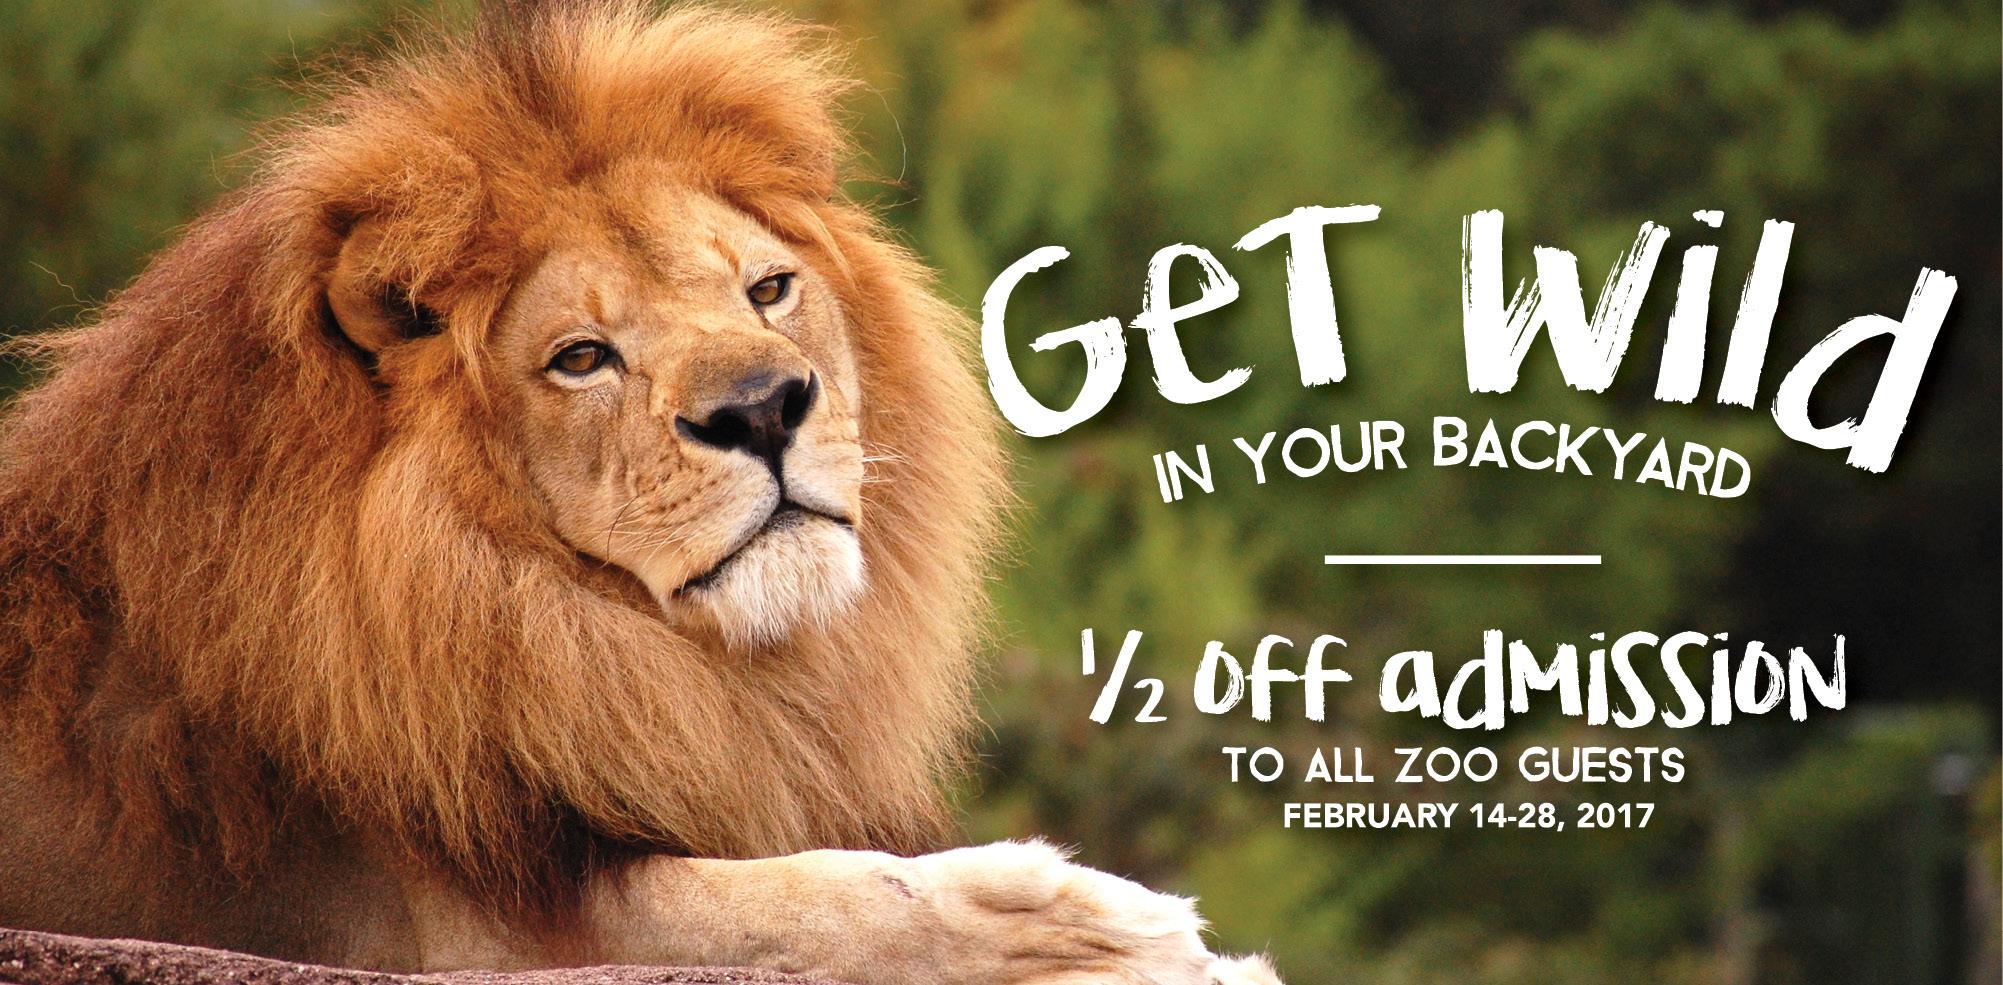 VAZOO_Get Wild Discount web banner